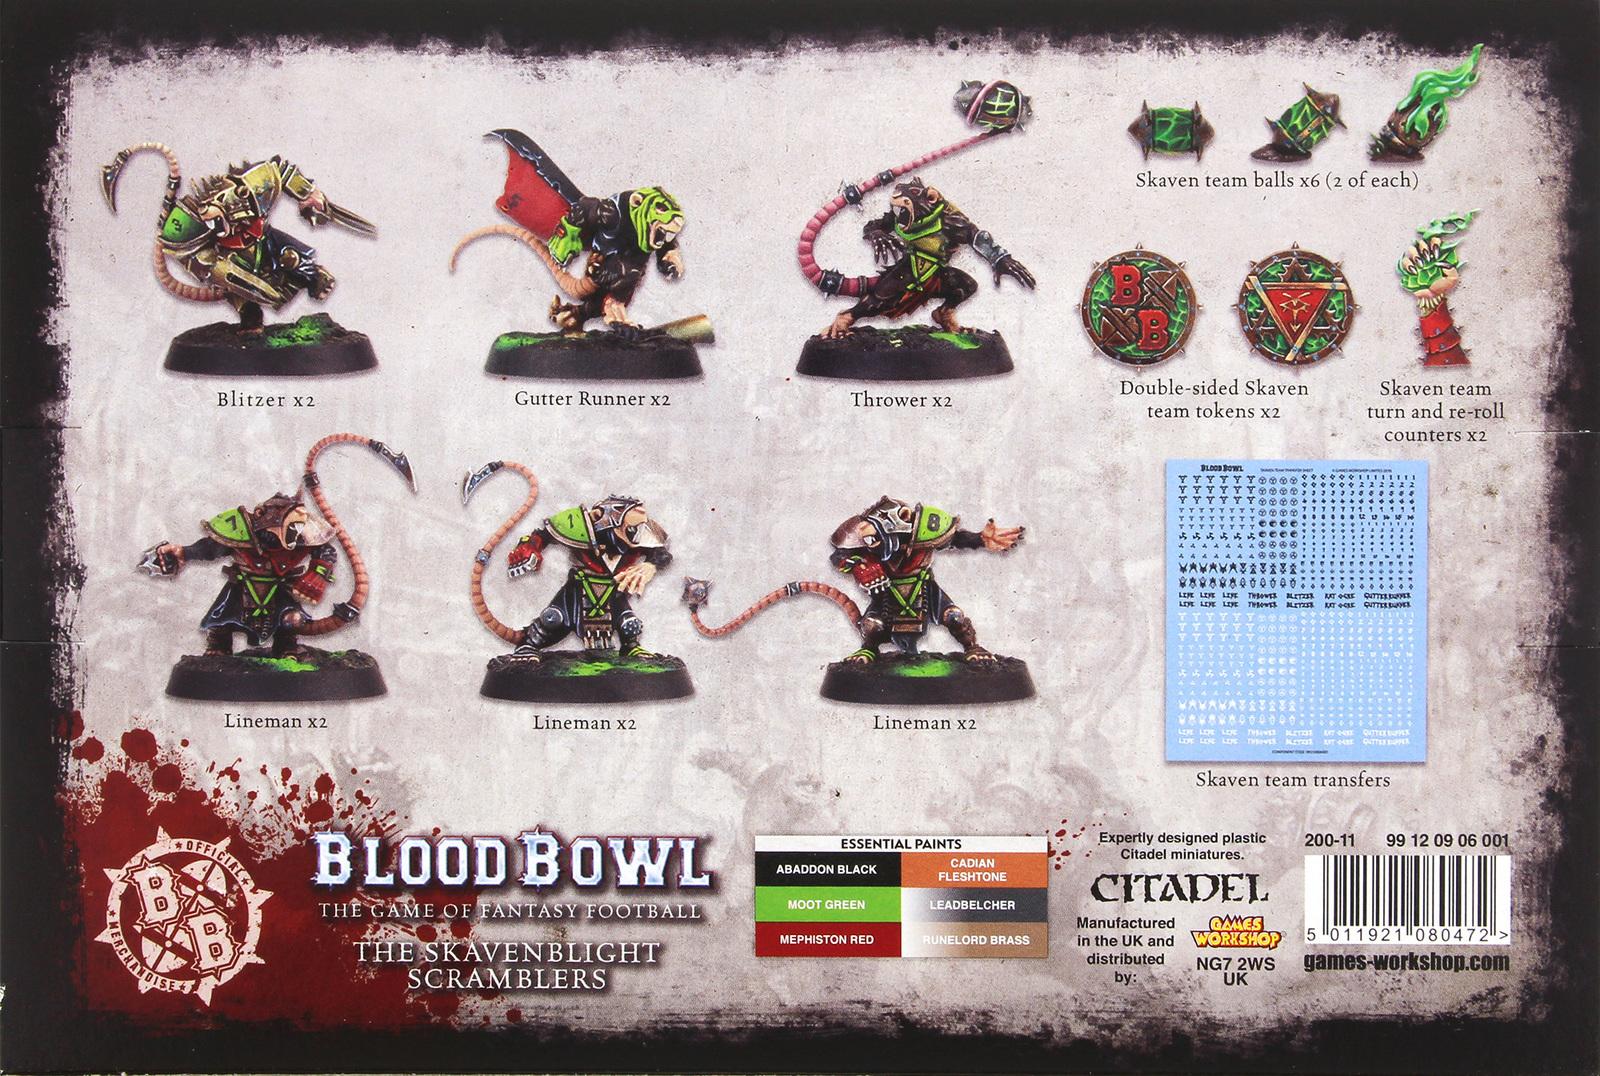 Blood Bowl: Skavenblight Scramblers image